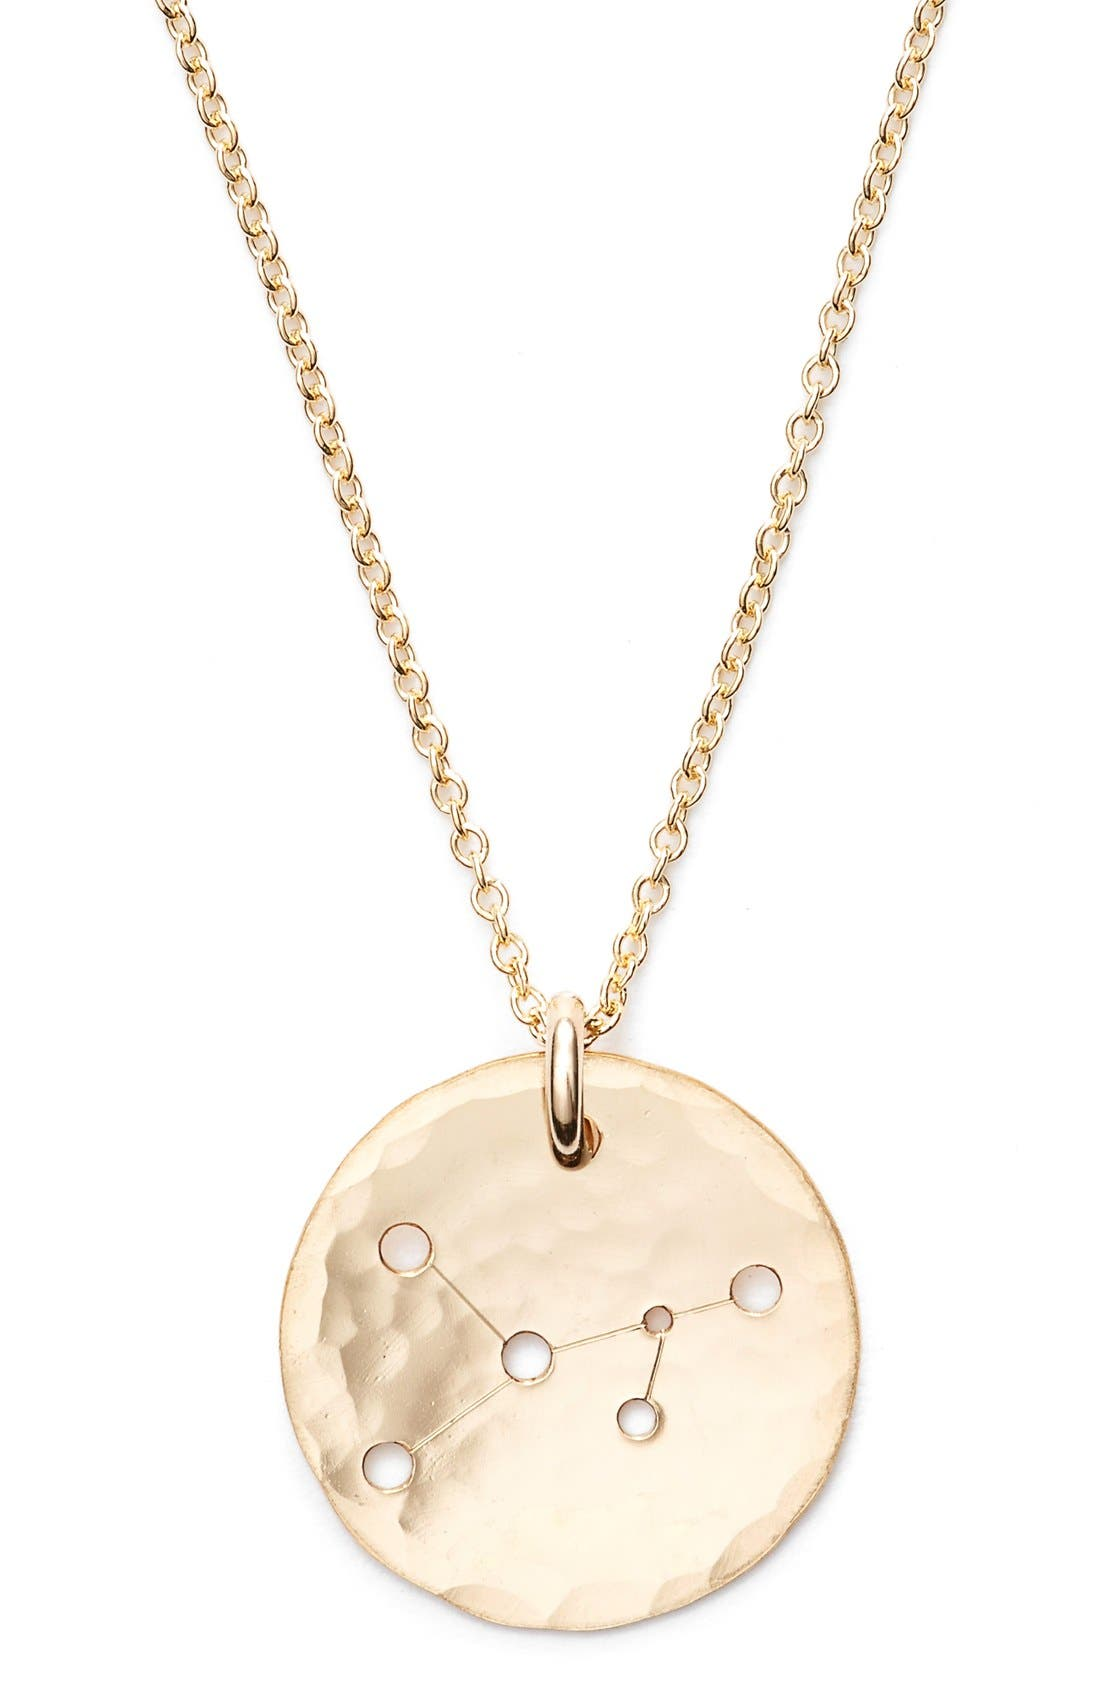 Ija 'Small Zodiac' 14k-Gold Fill Necklace,                             Alternate thumbnail 28, color,